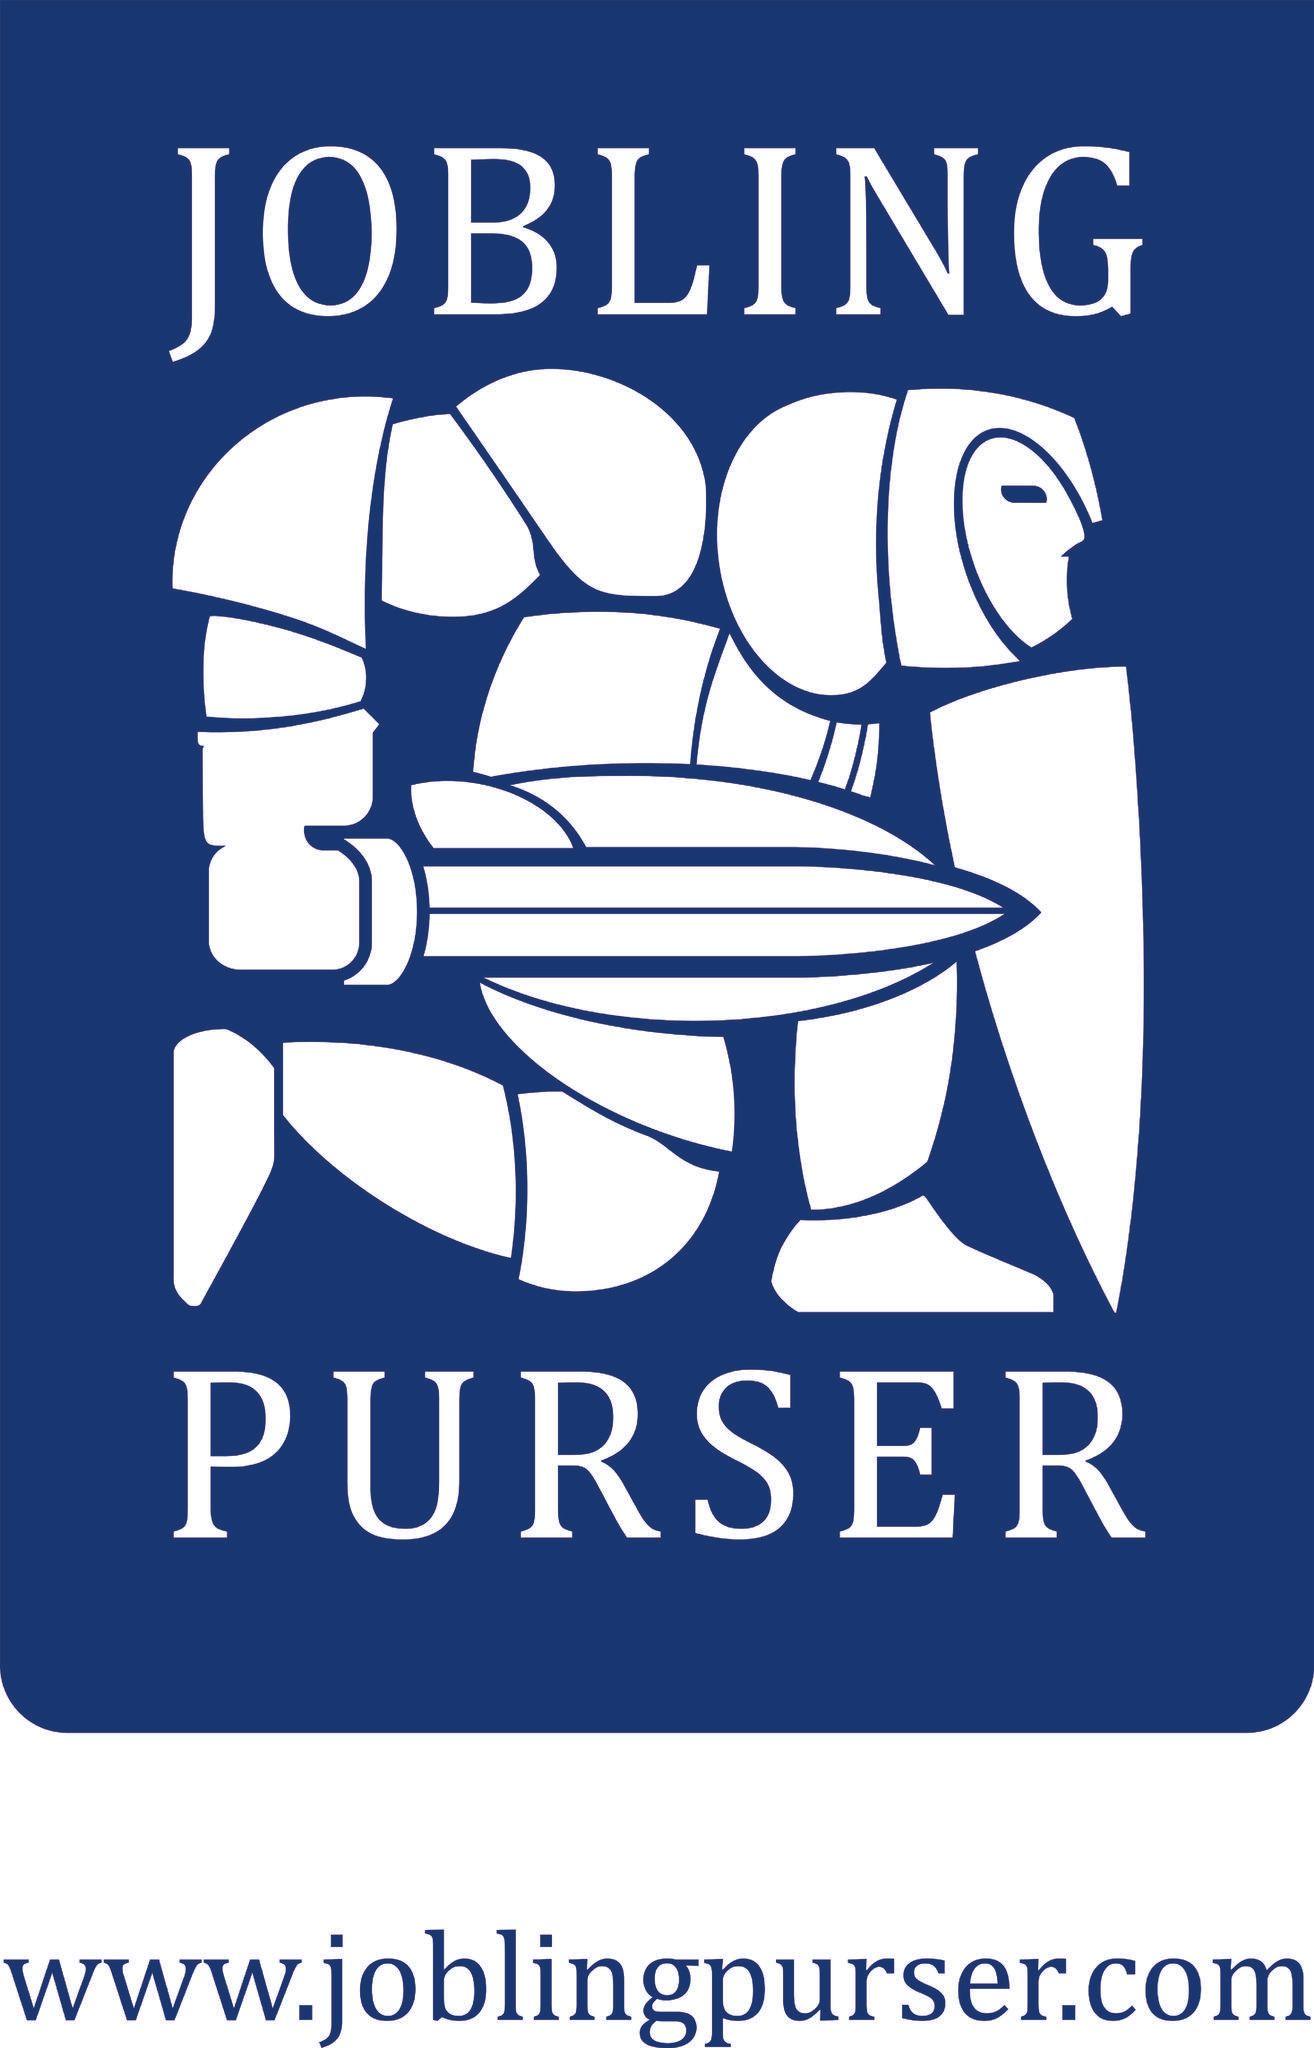 Jobling Purser Ltd.